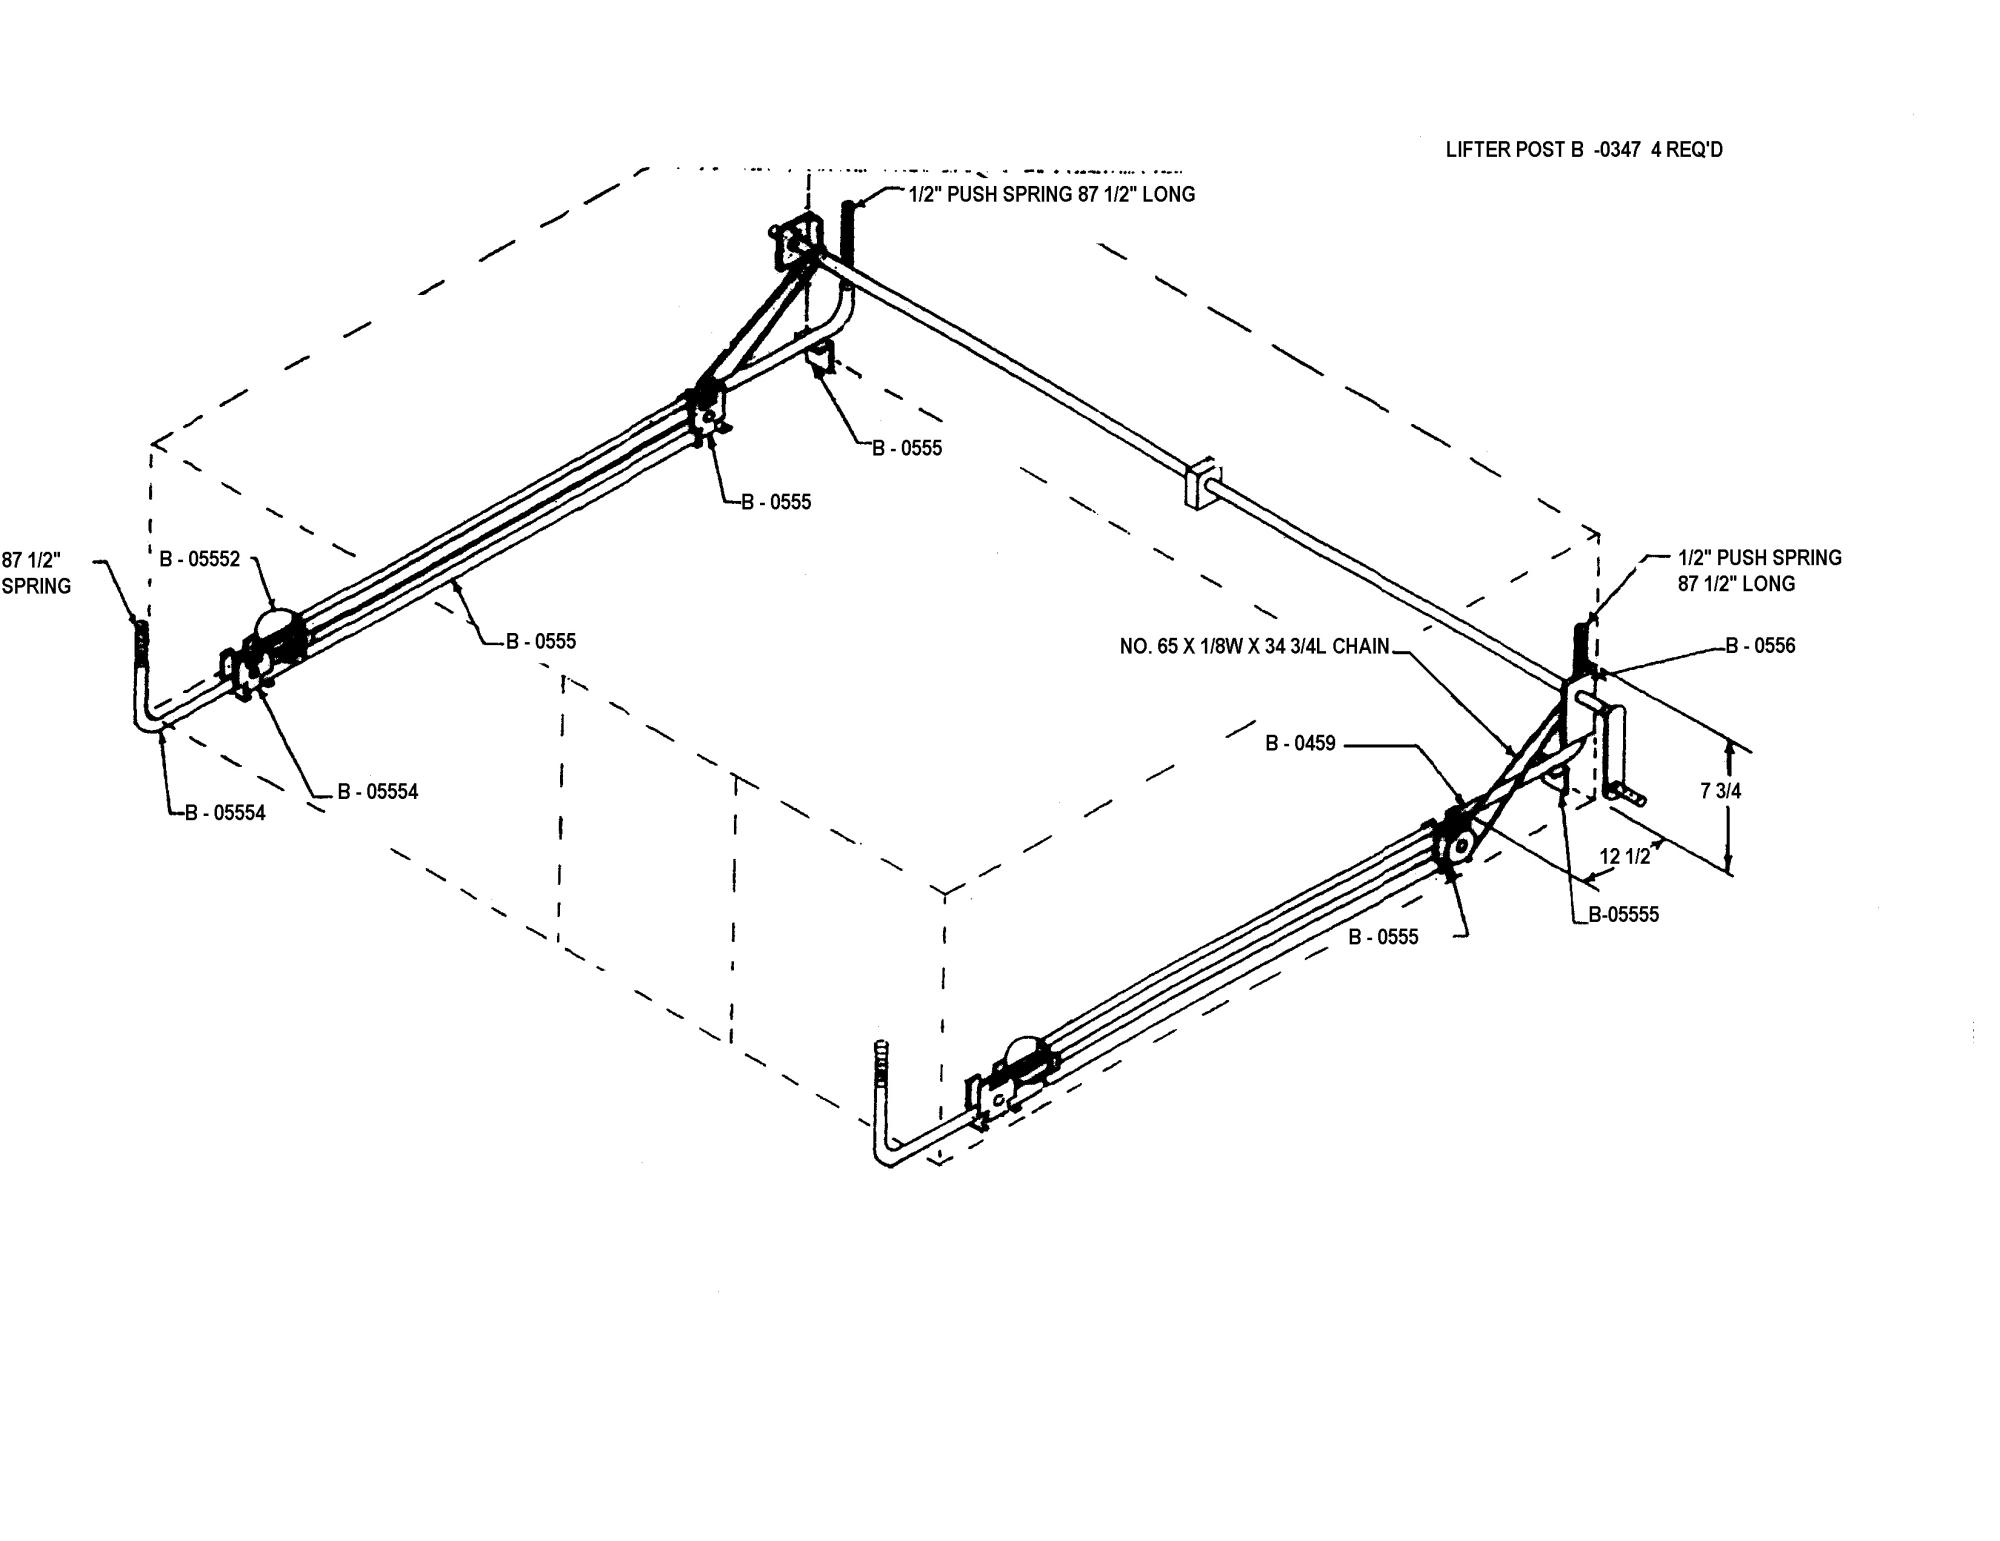 hight resolution of tent camper lift motor wiring diagram wiring library skamper pop up camper wiring diagram viking pop up camper wiring diagram